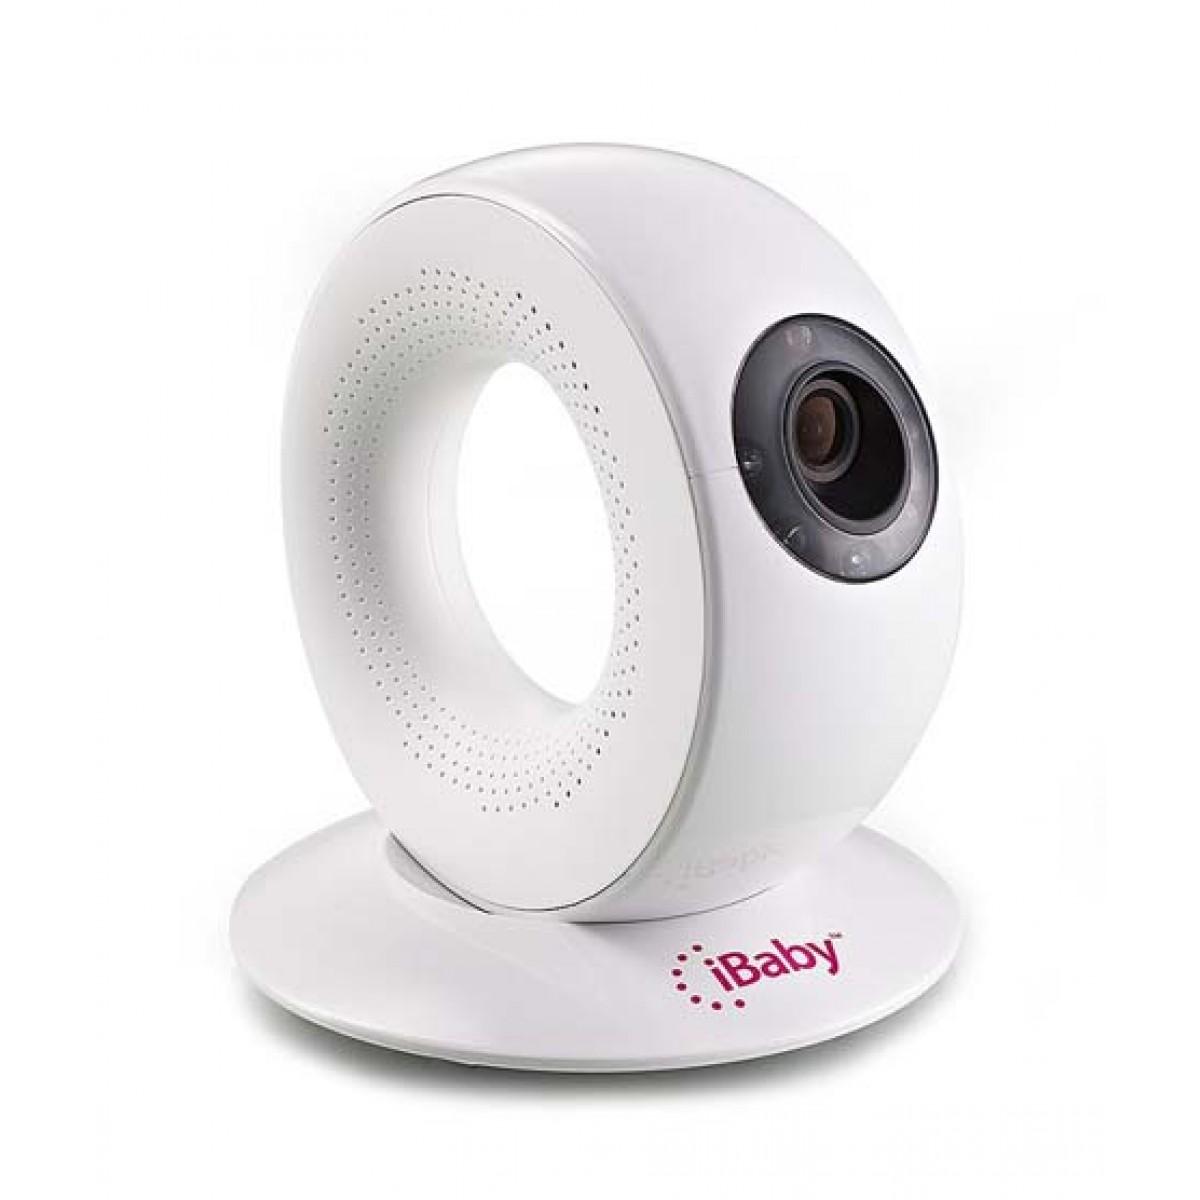 iHealth iBaby Digital Video Monitor (M2)